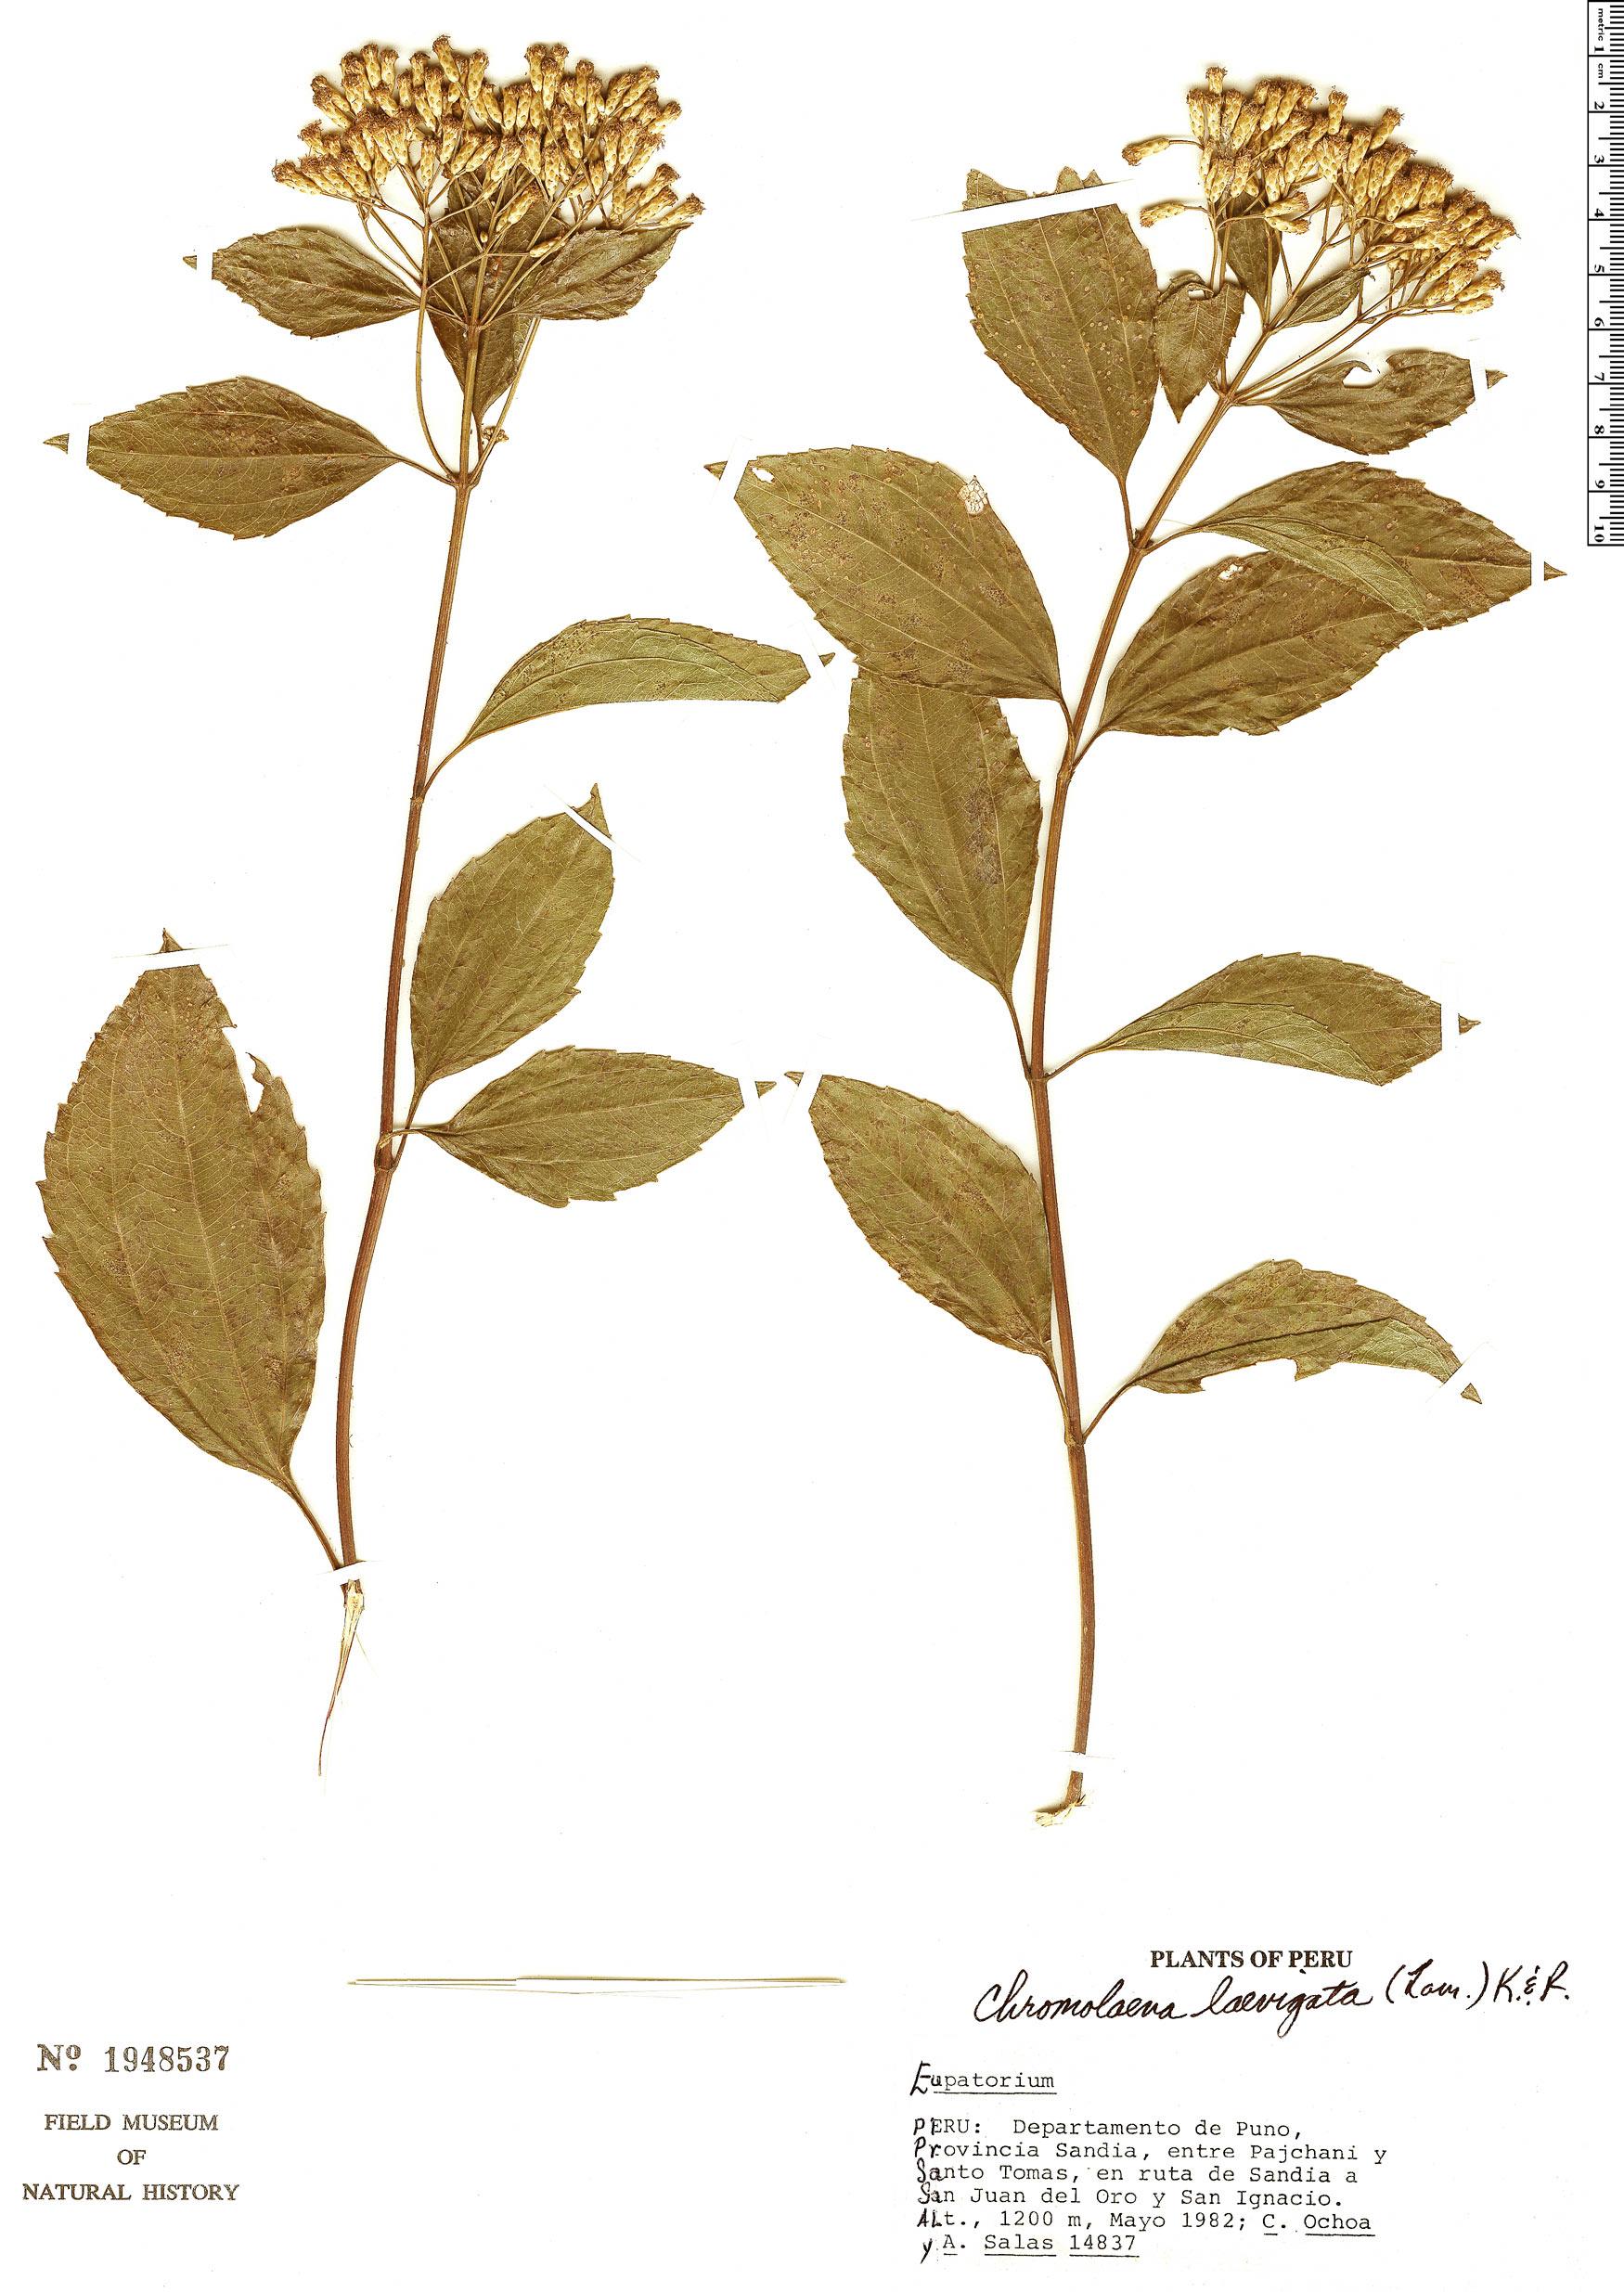 Specimen: Chromolaena laevigata